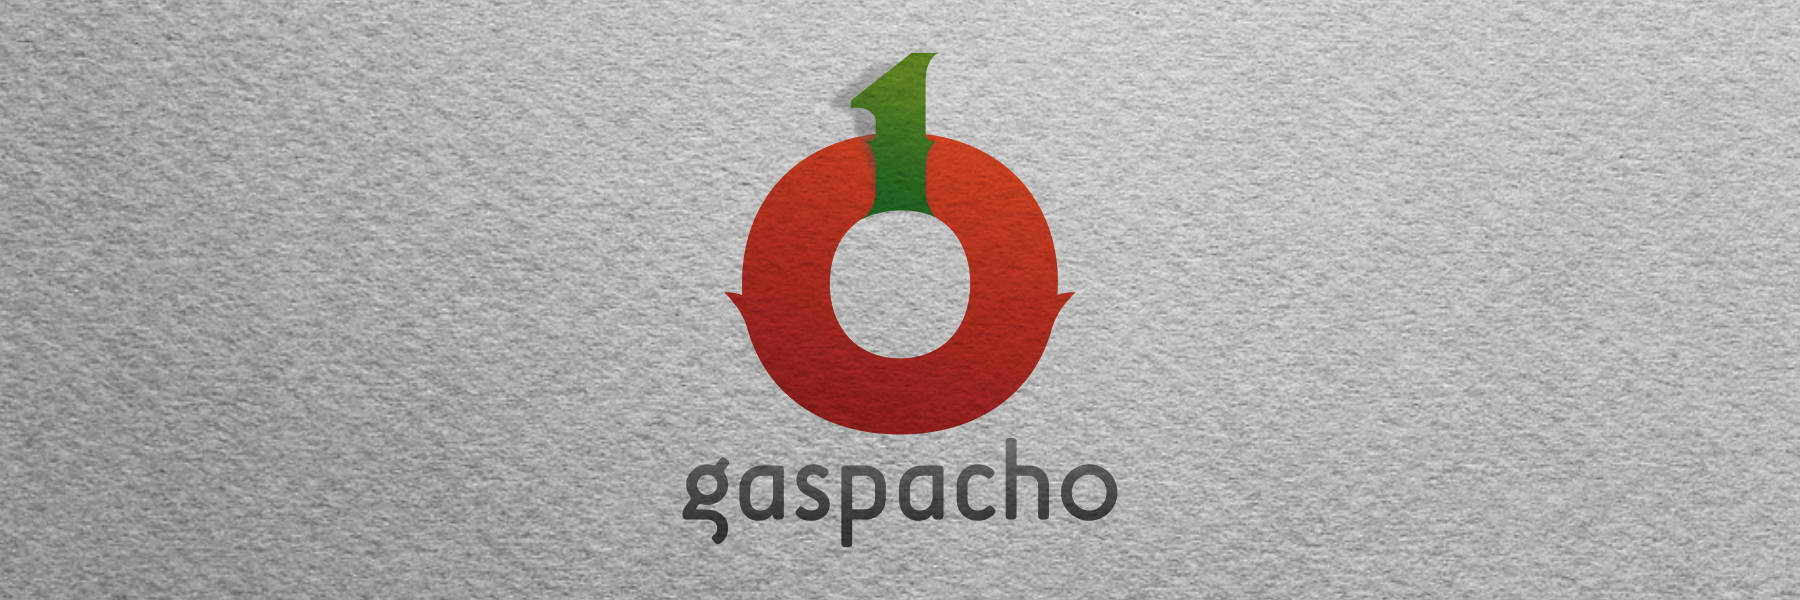 logo-gaspacho_header